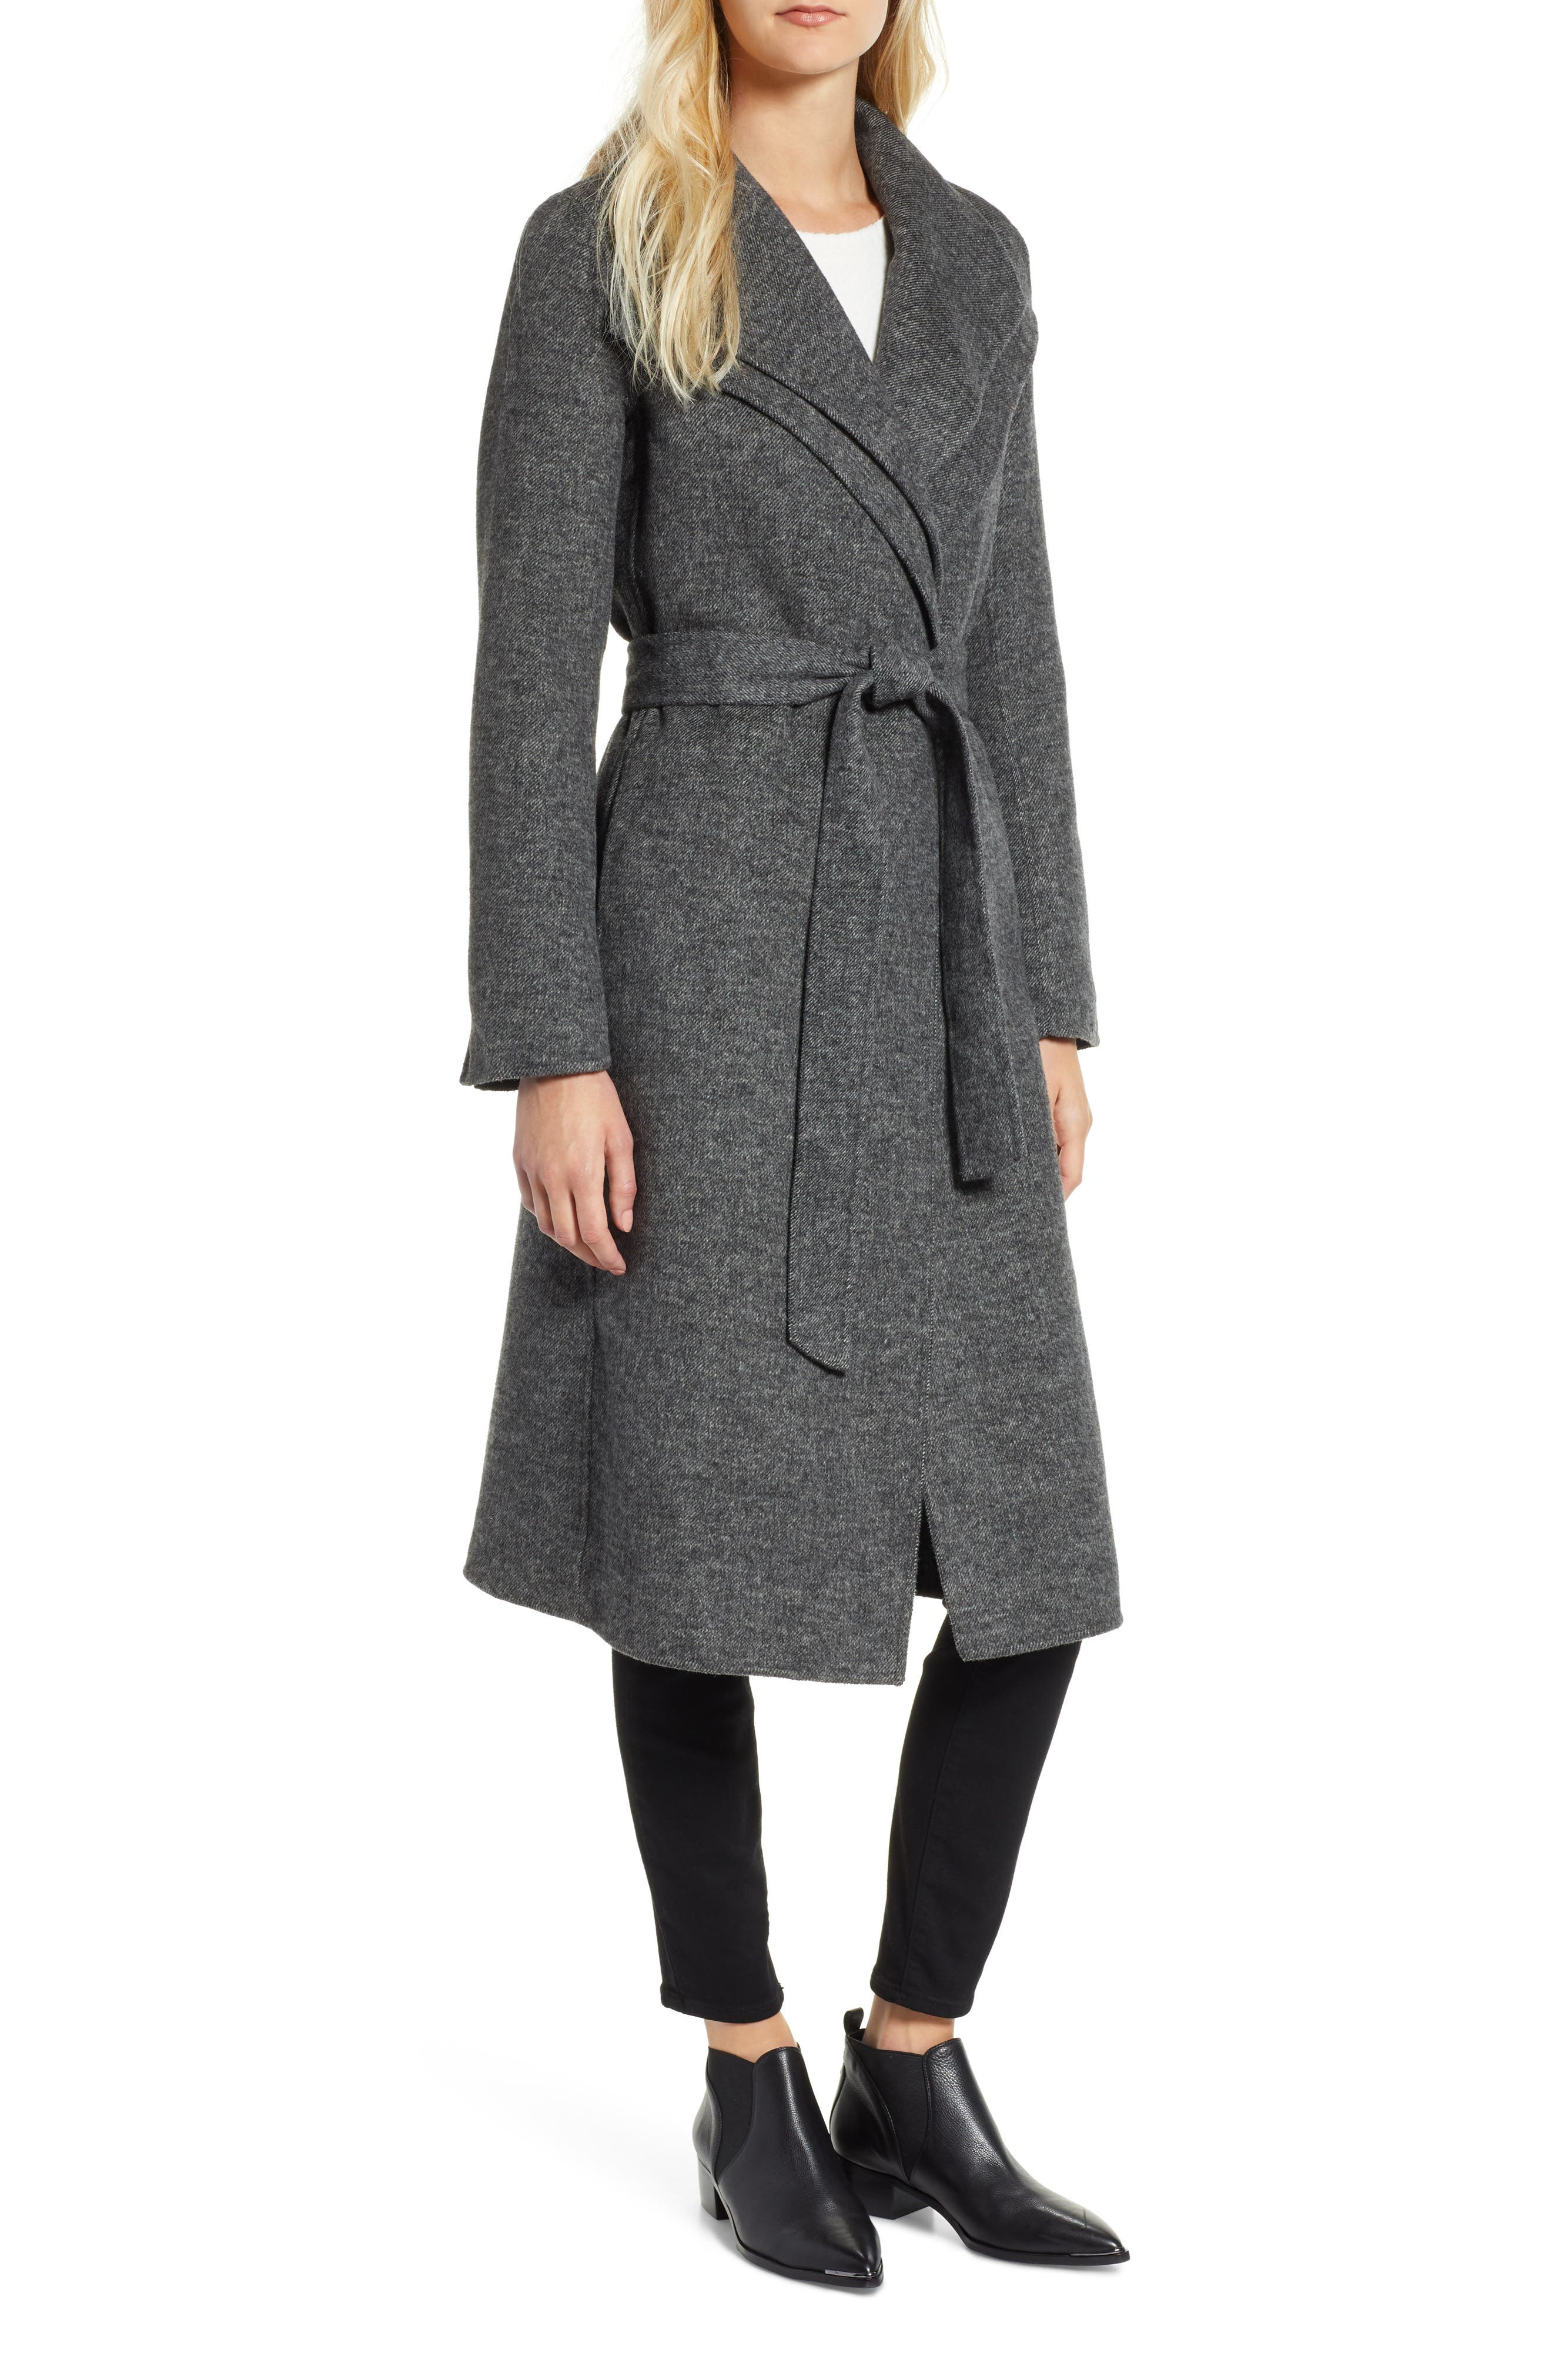 Elliot Wool Blend Wrap Coat,                             Main thumbnail 1, color,                             022